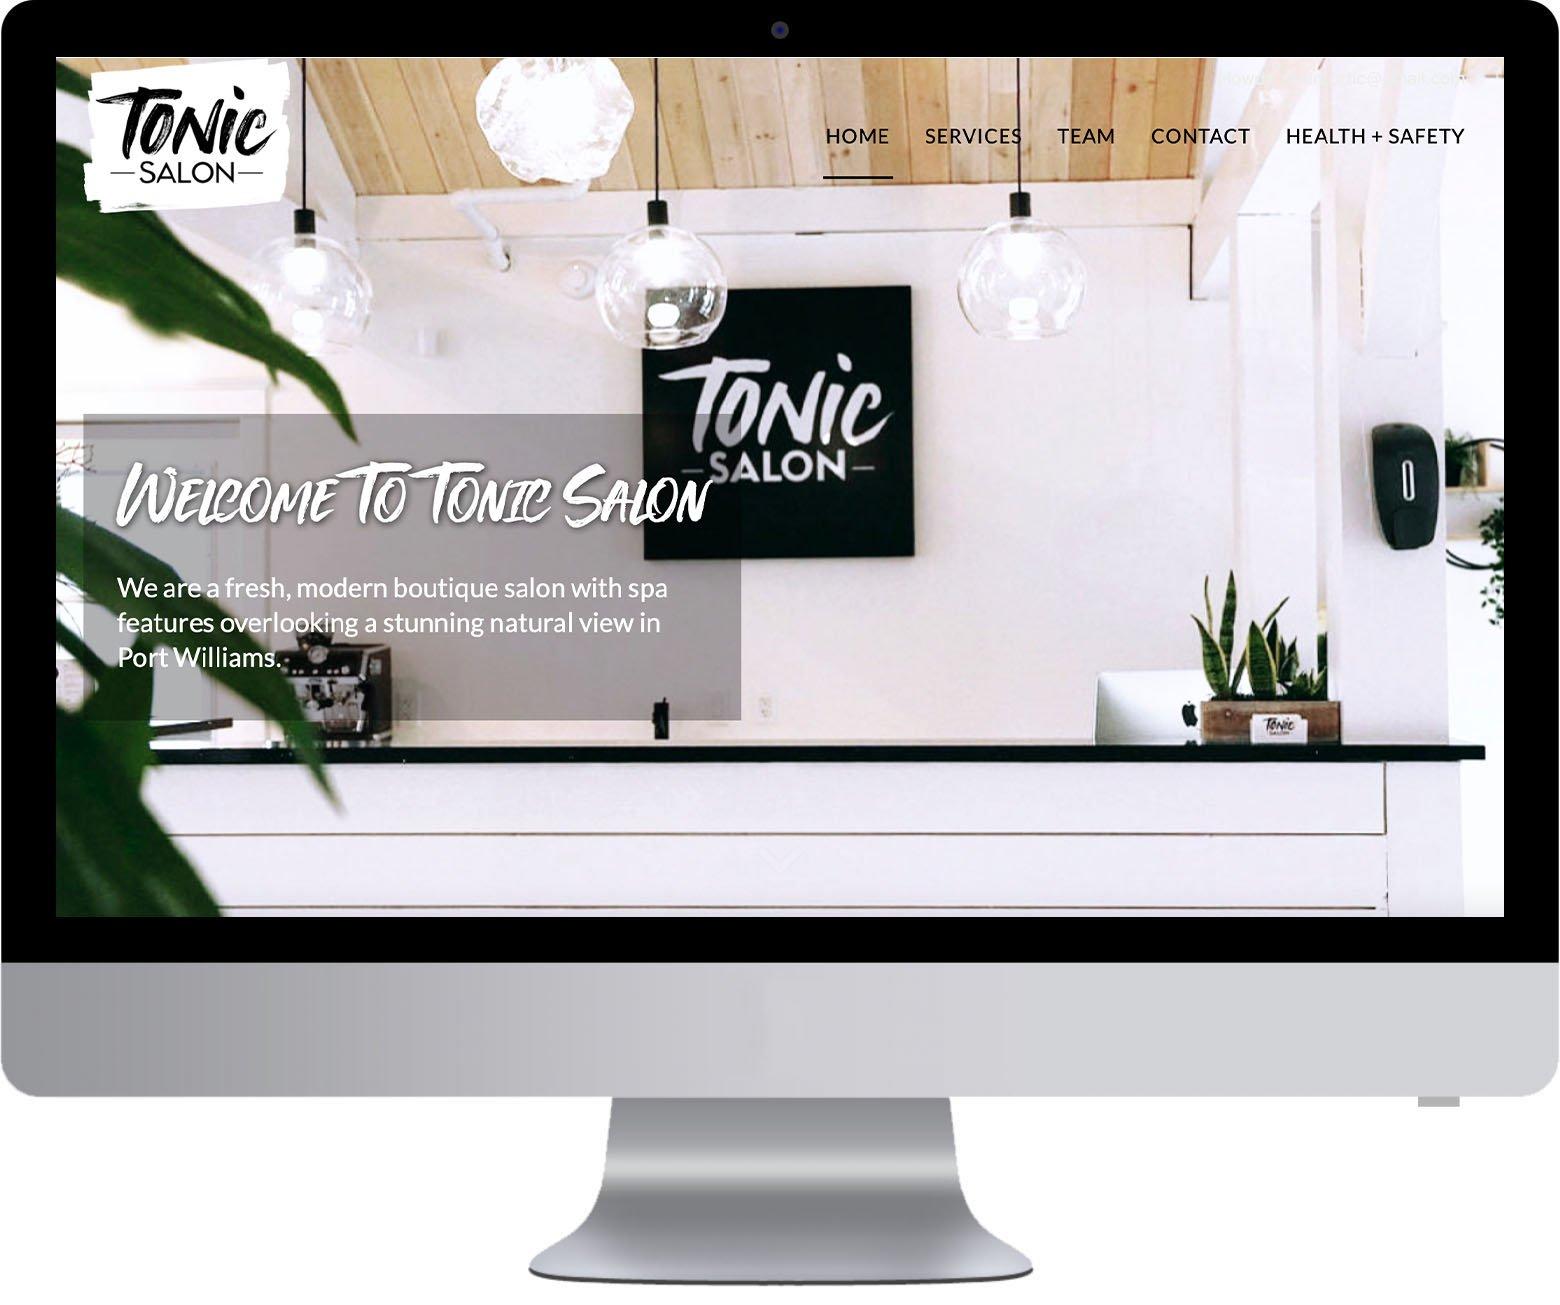 Nova Scotia Website Development - Tonic Salon